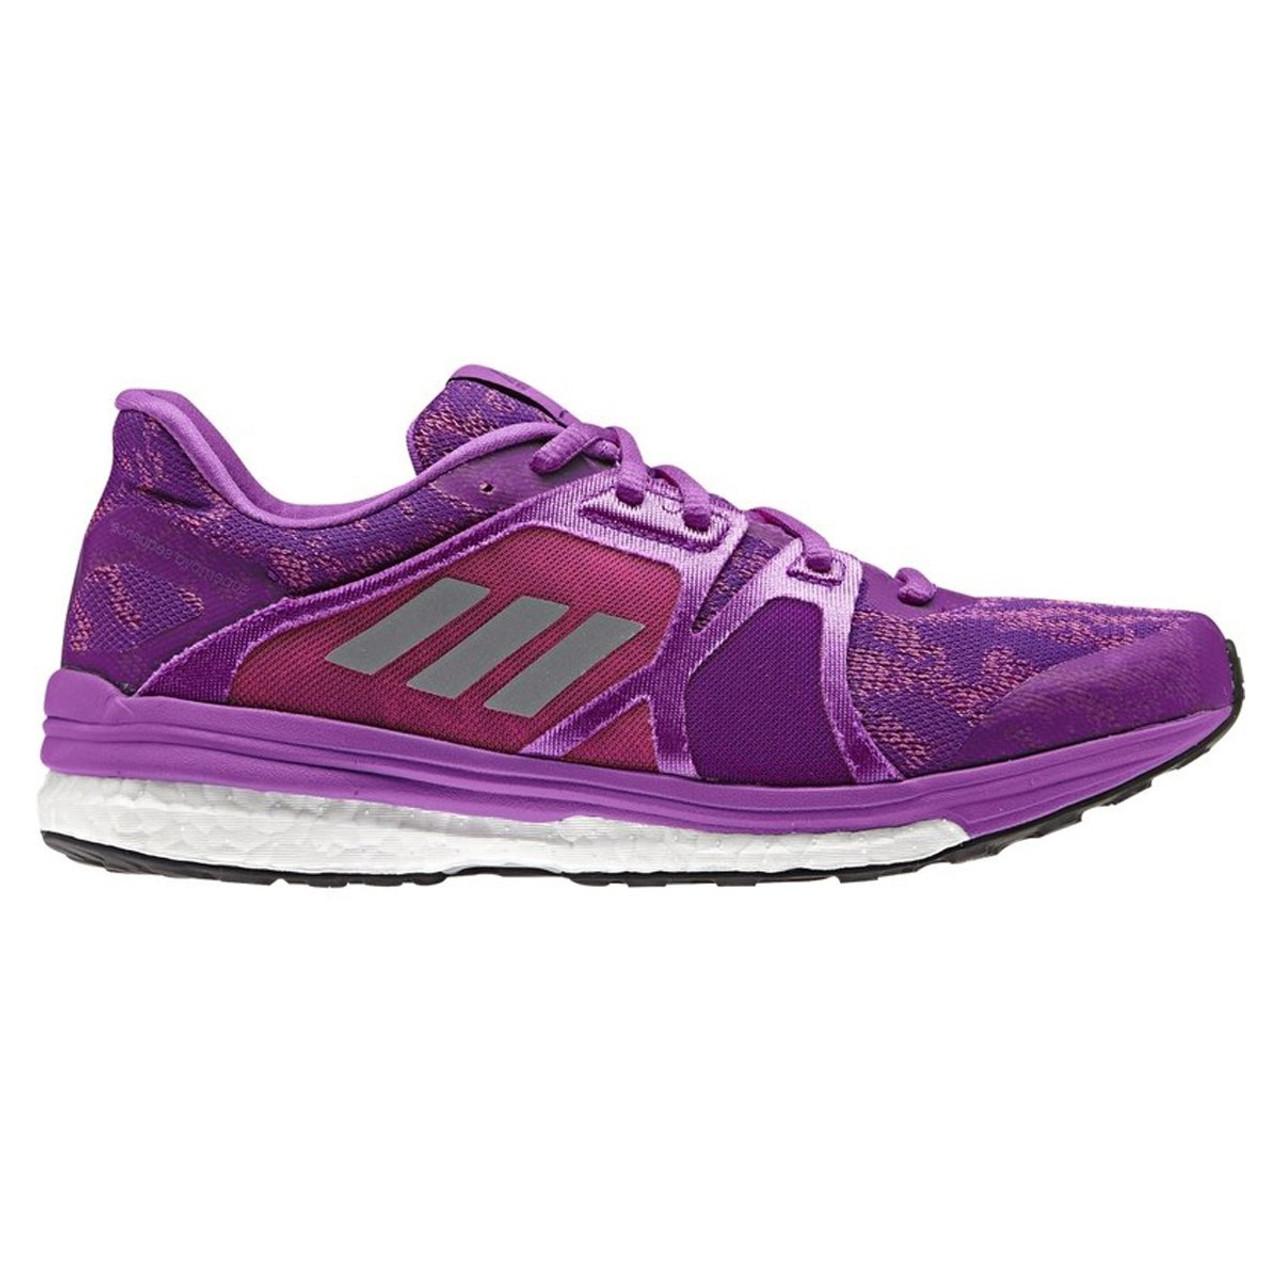 4fe24b714ece5 Adidas Supernova Sequence 9 Women s Running Shoes AQ3548 - Purple ...